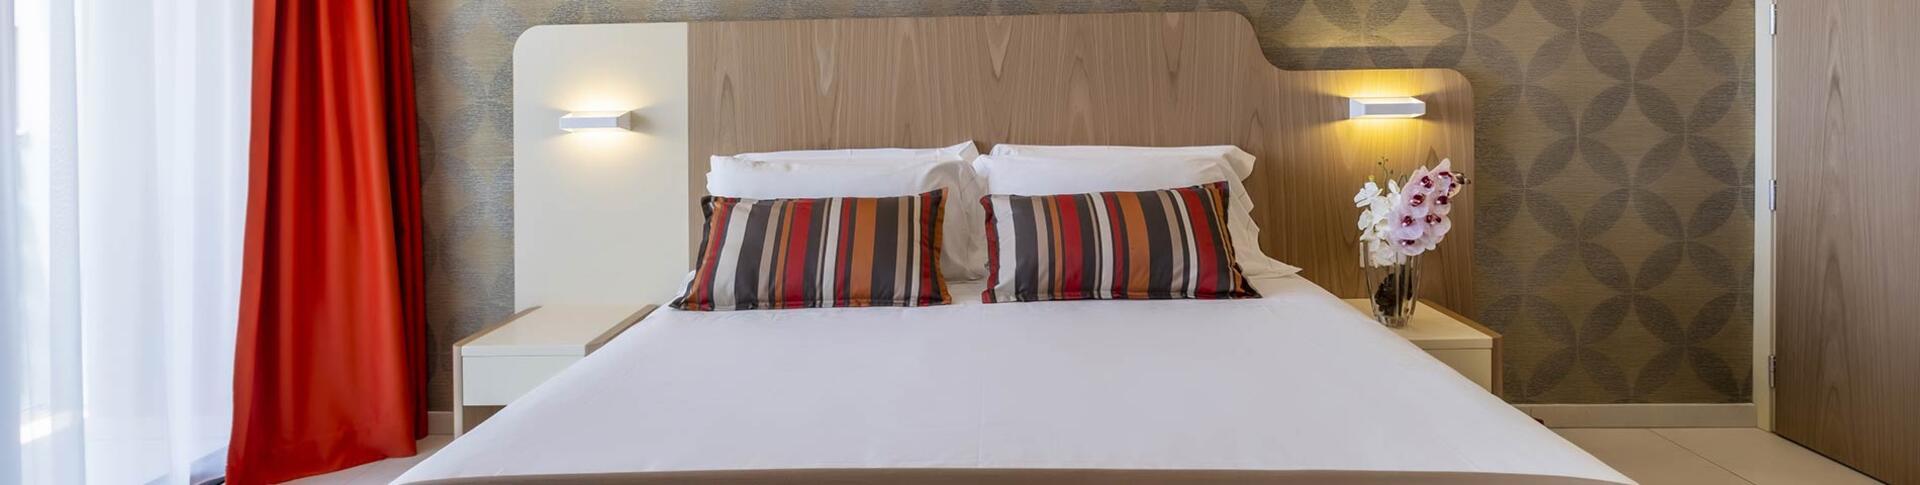 ariahotel en classic-room 015